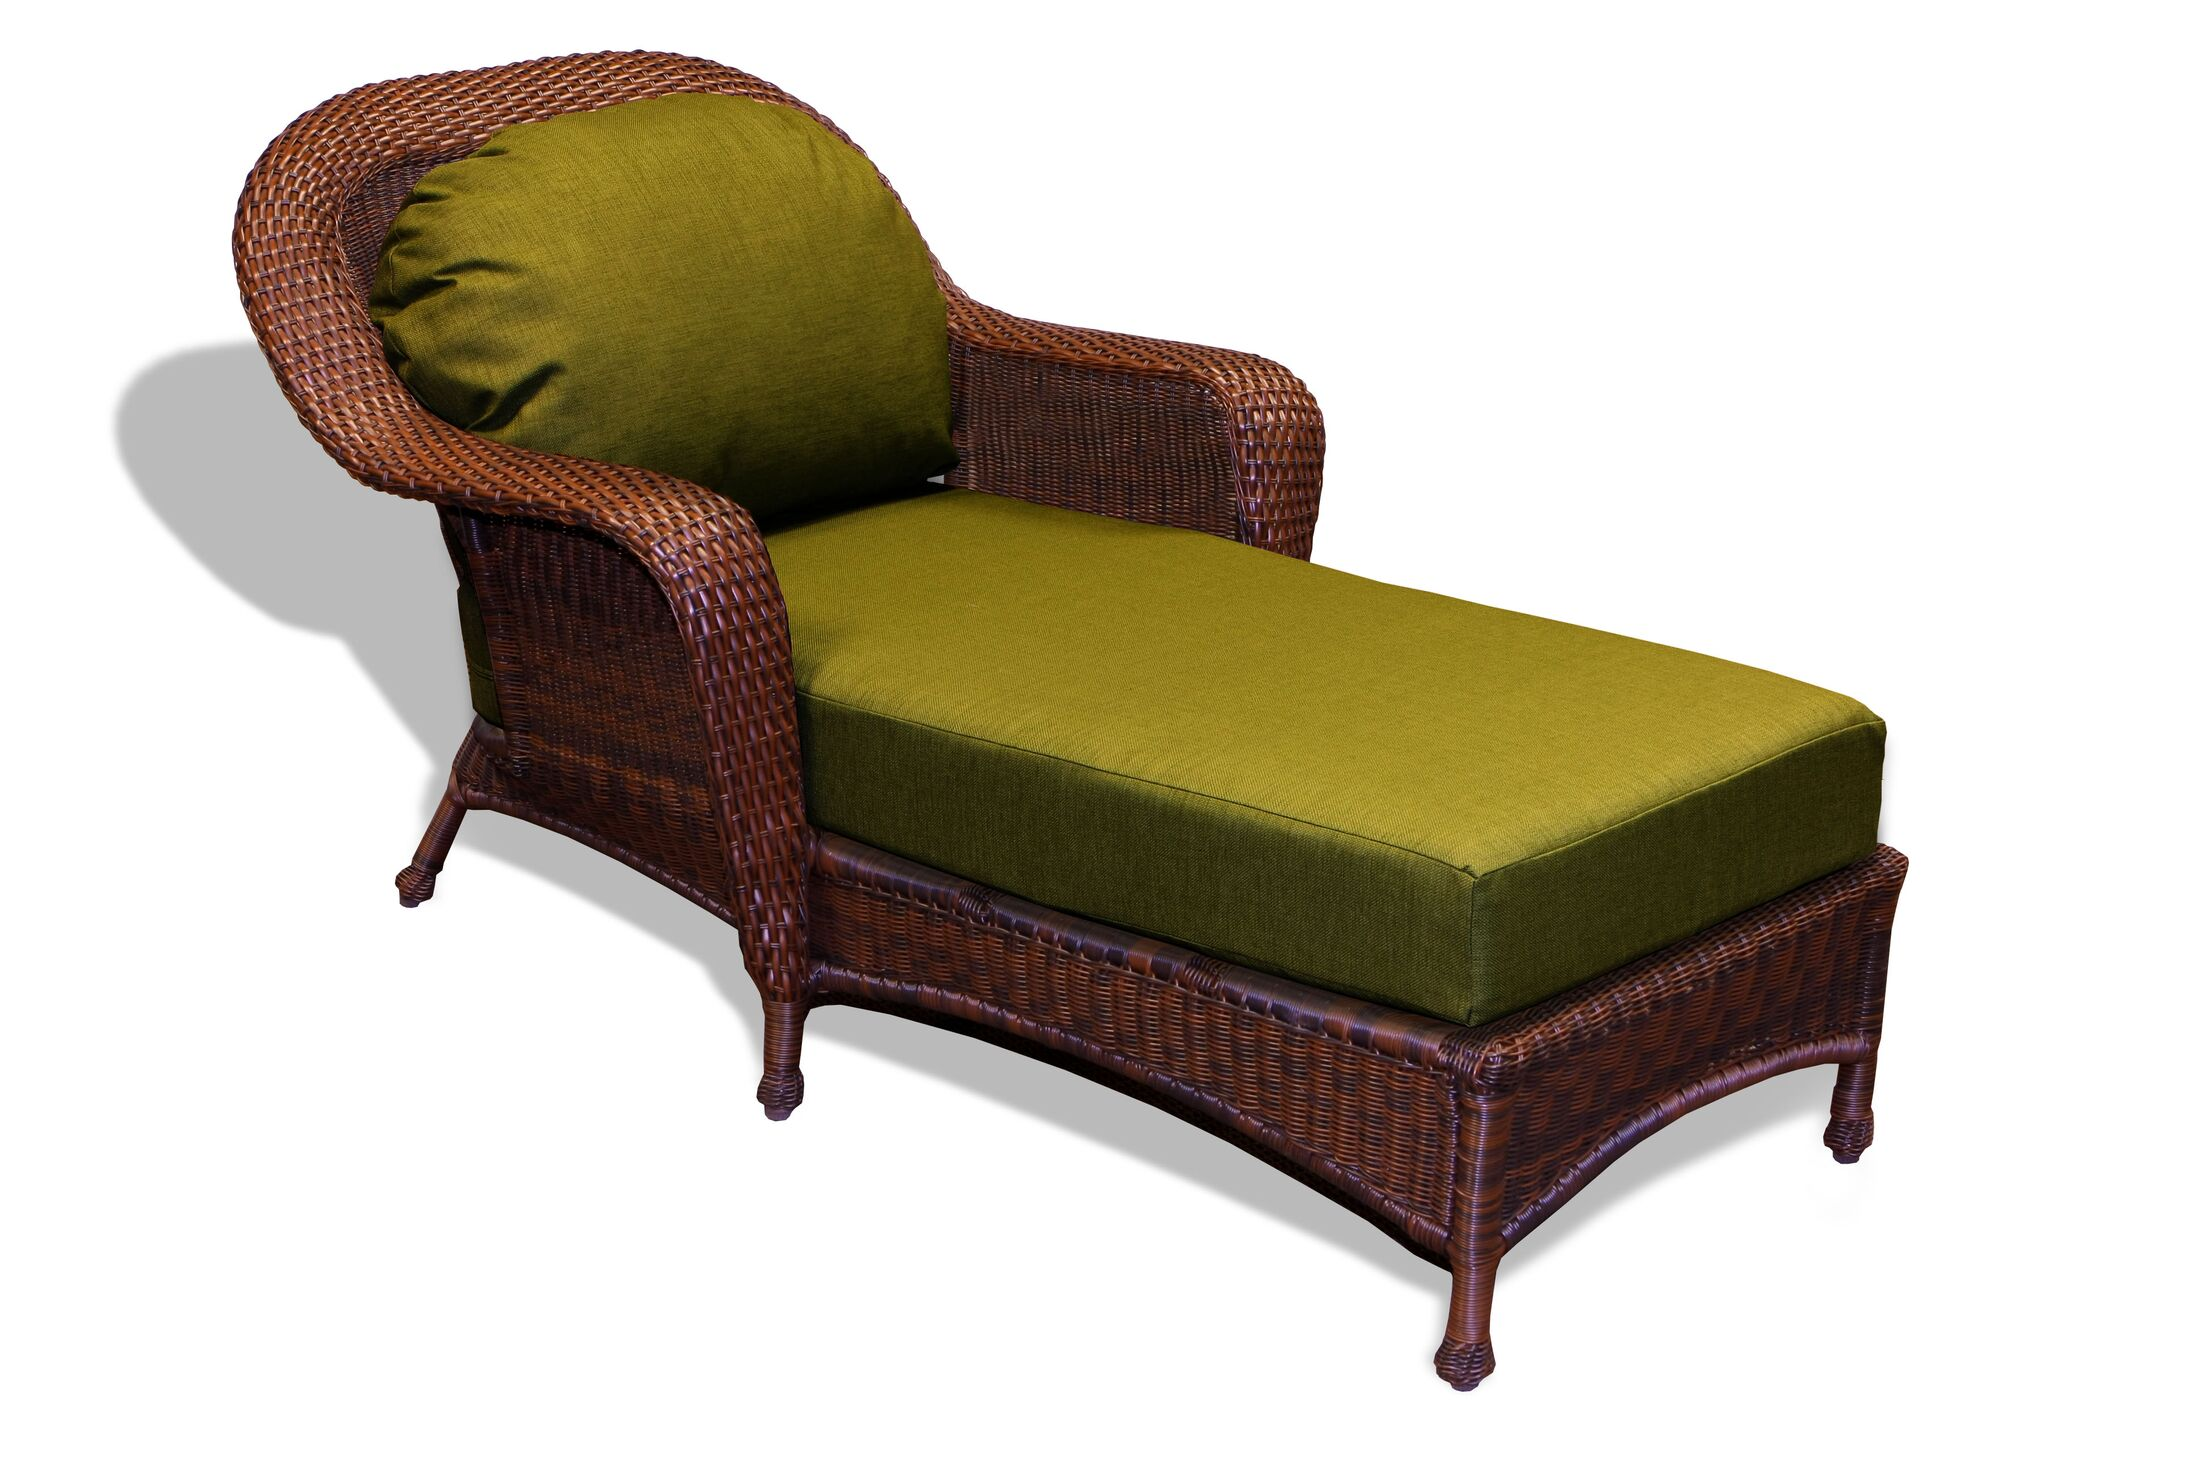 Fleischmann Chaise Lounge with Cushion Fabric: Rave Pine, Finish: Java